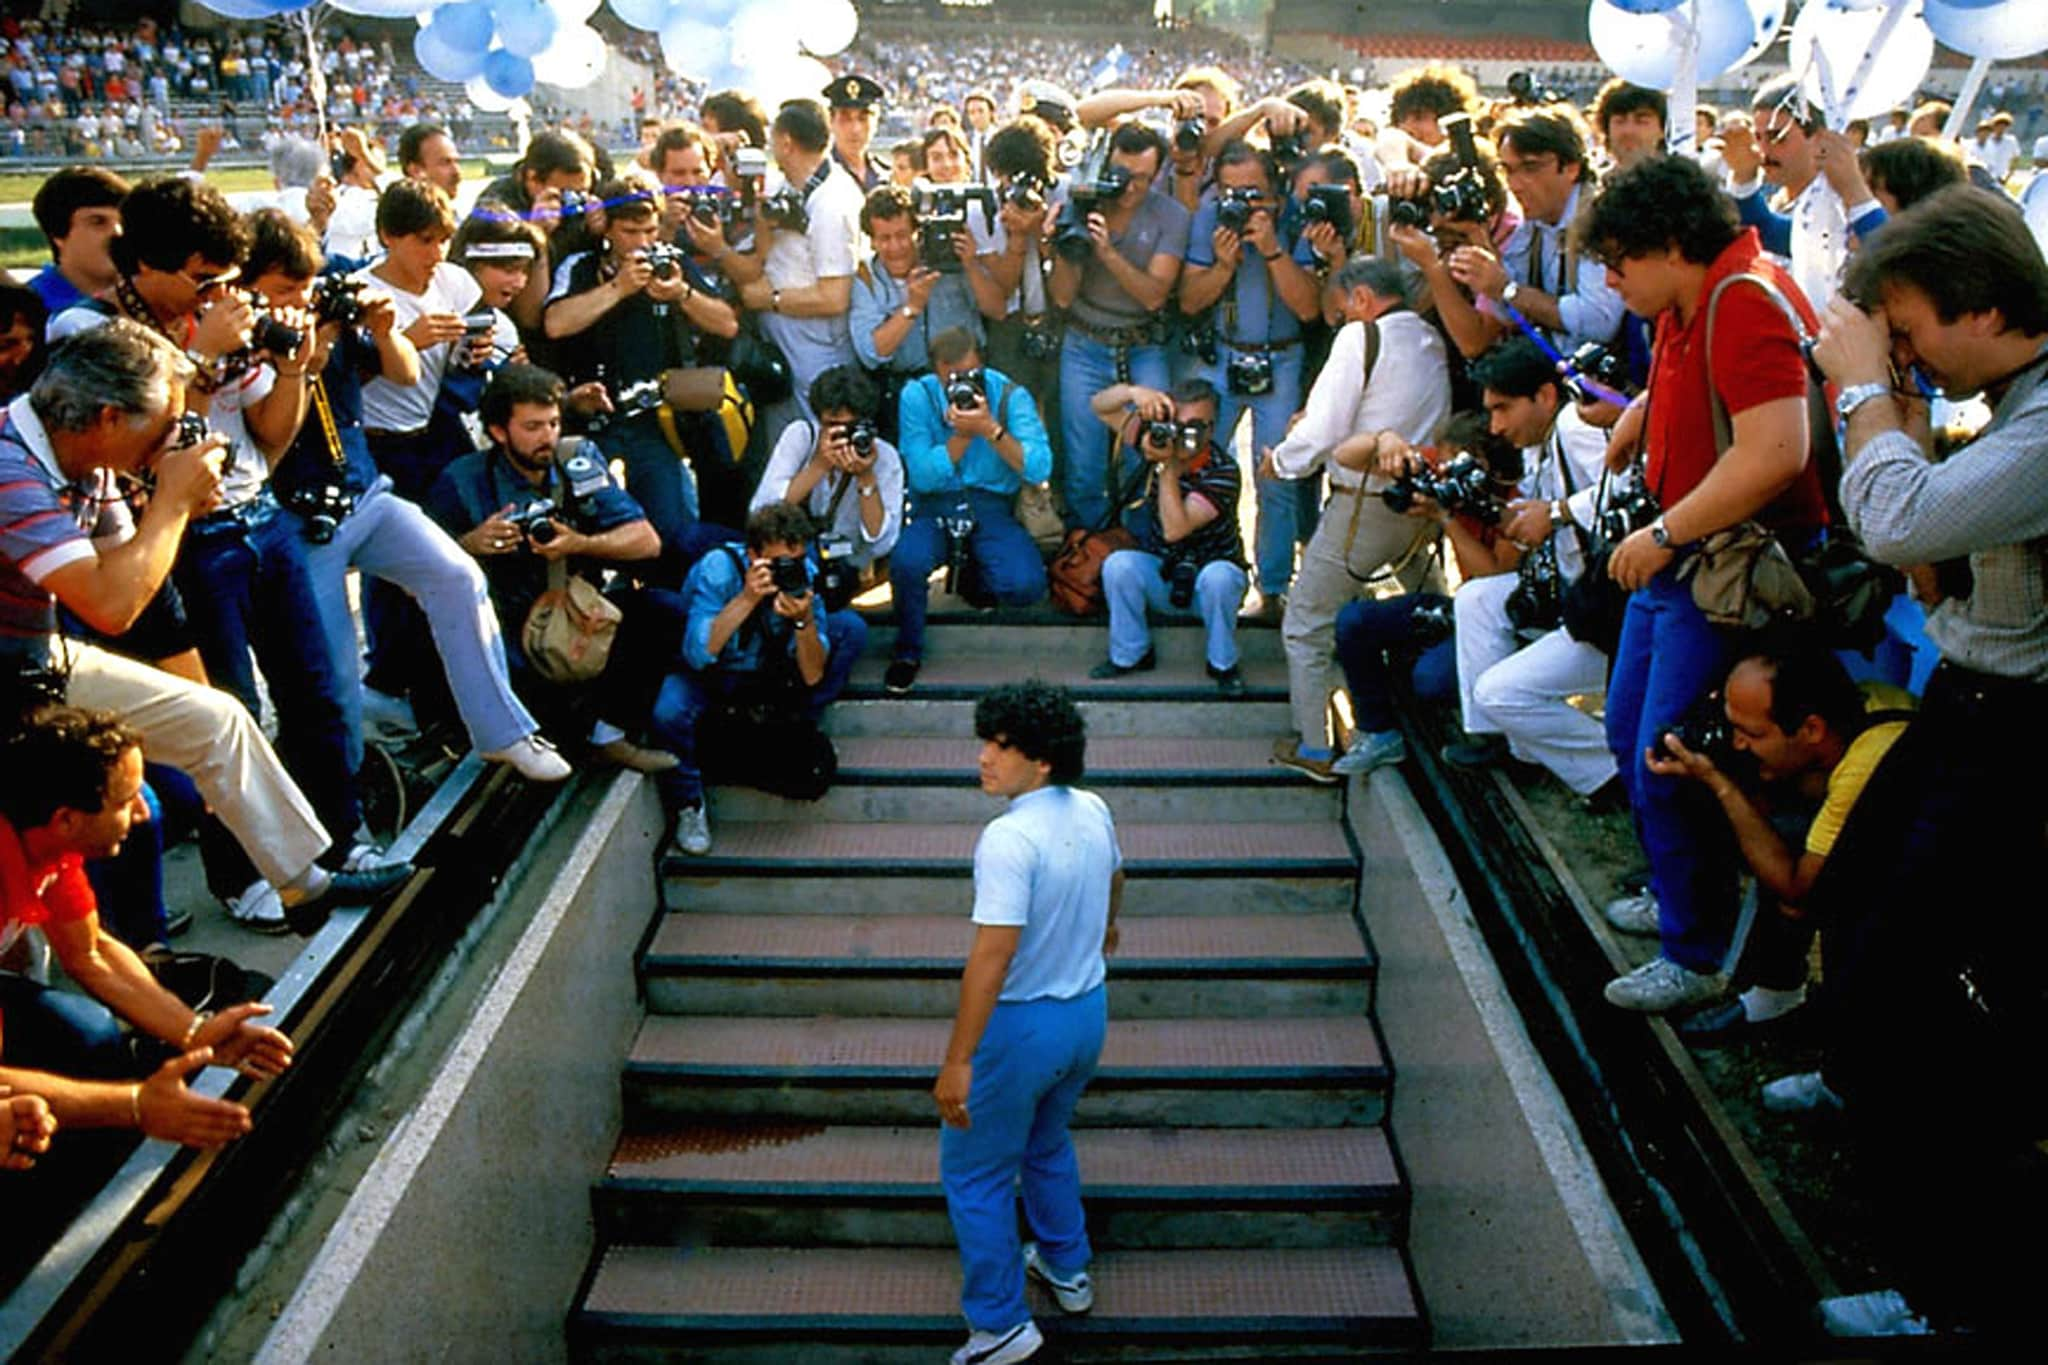 Linea d'Ombra Festival, Maradona è megli'e Pelè? | RB Casting